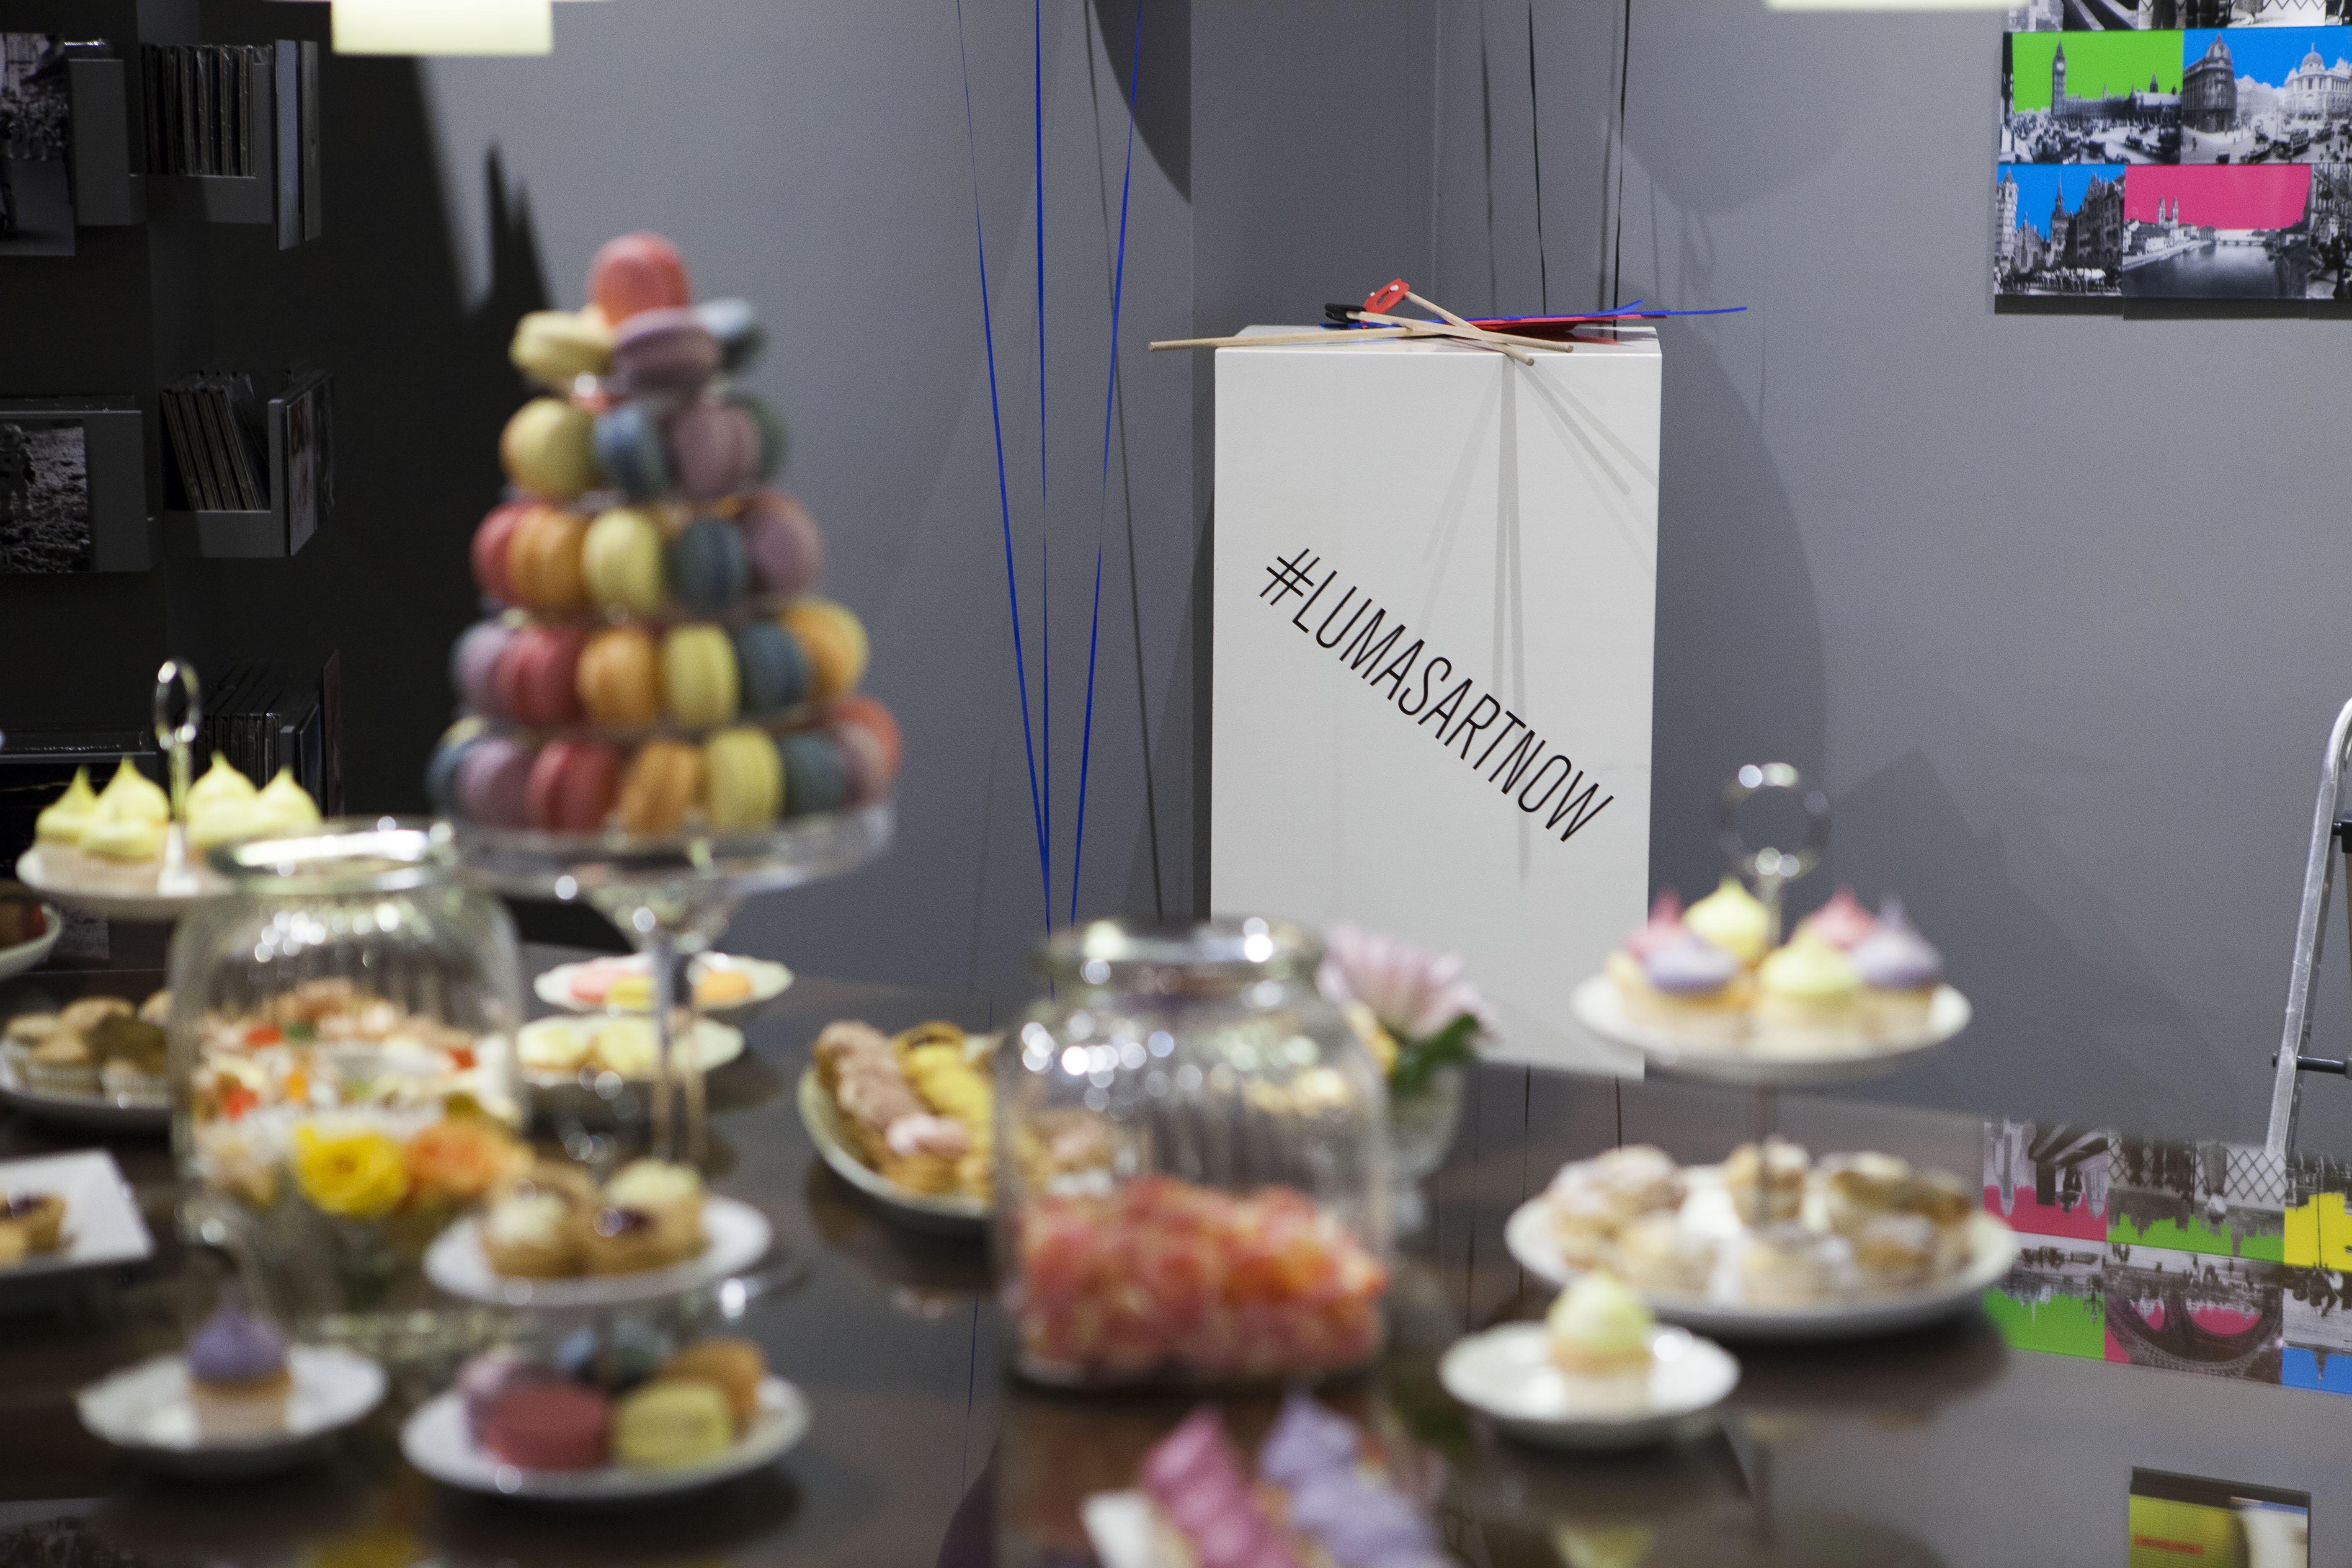 lumasartnow kunst f r alle mode shopping designer trends fashionstreet berlin. Black Bedroom Furniture Sets. Home Design Ideas